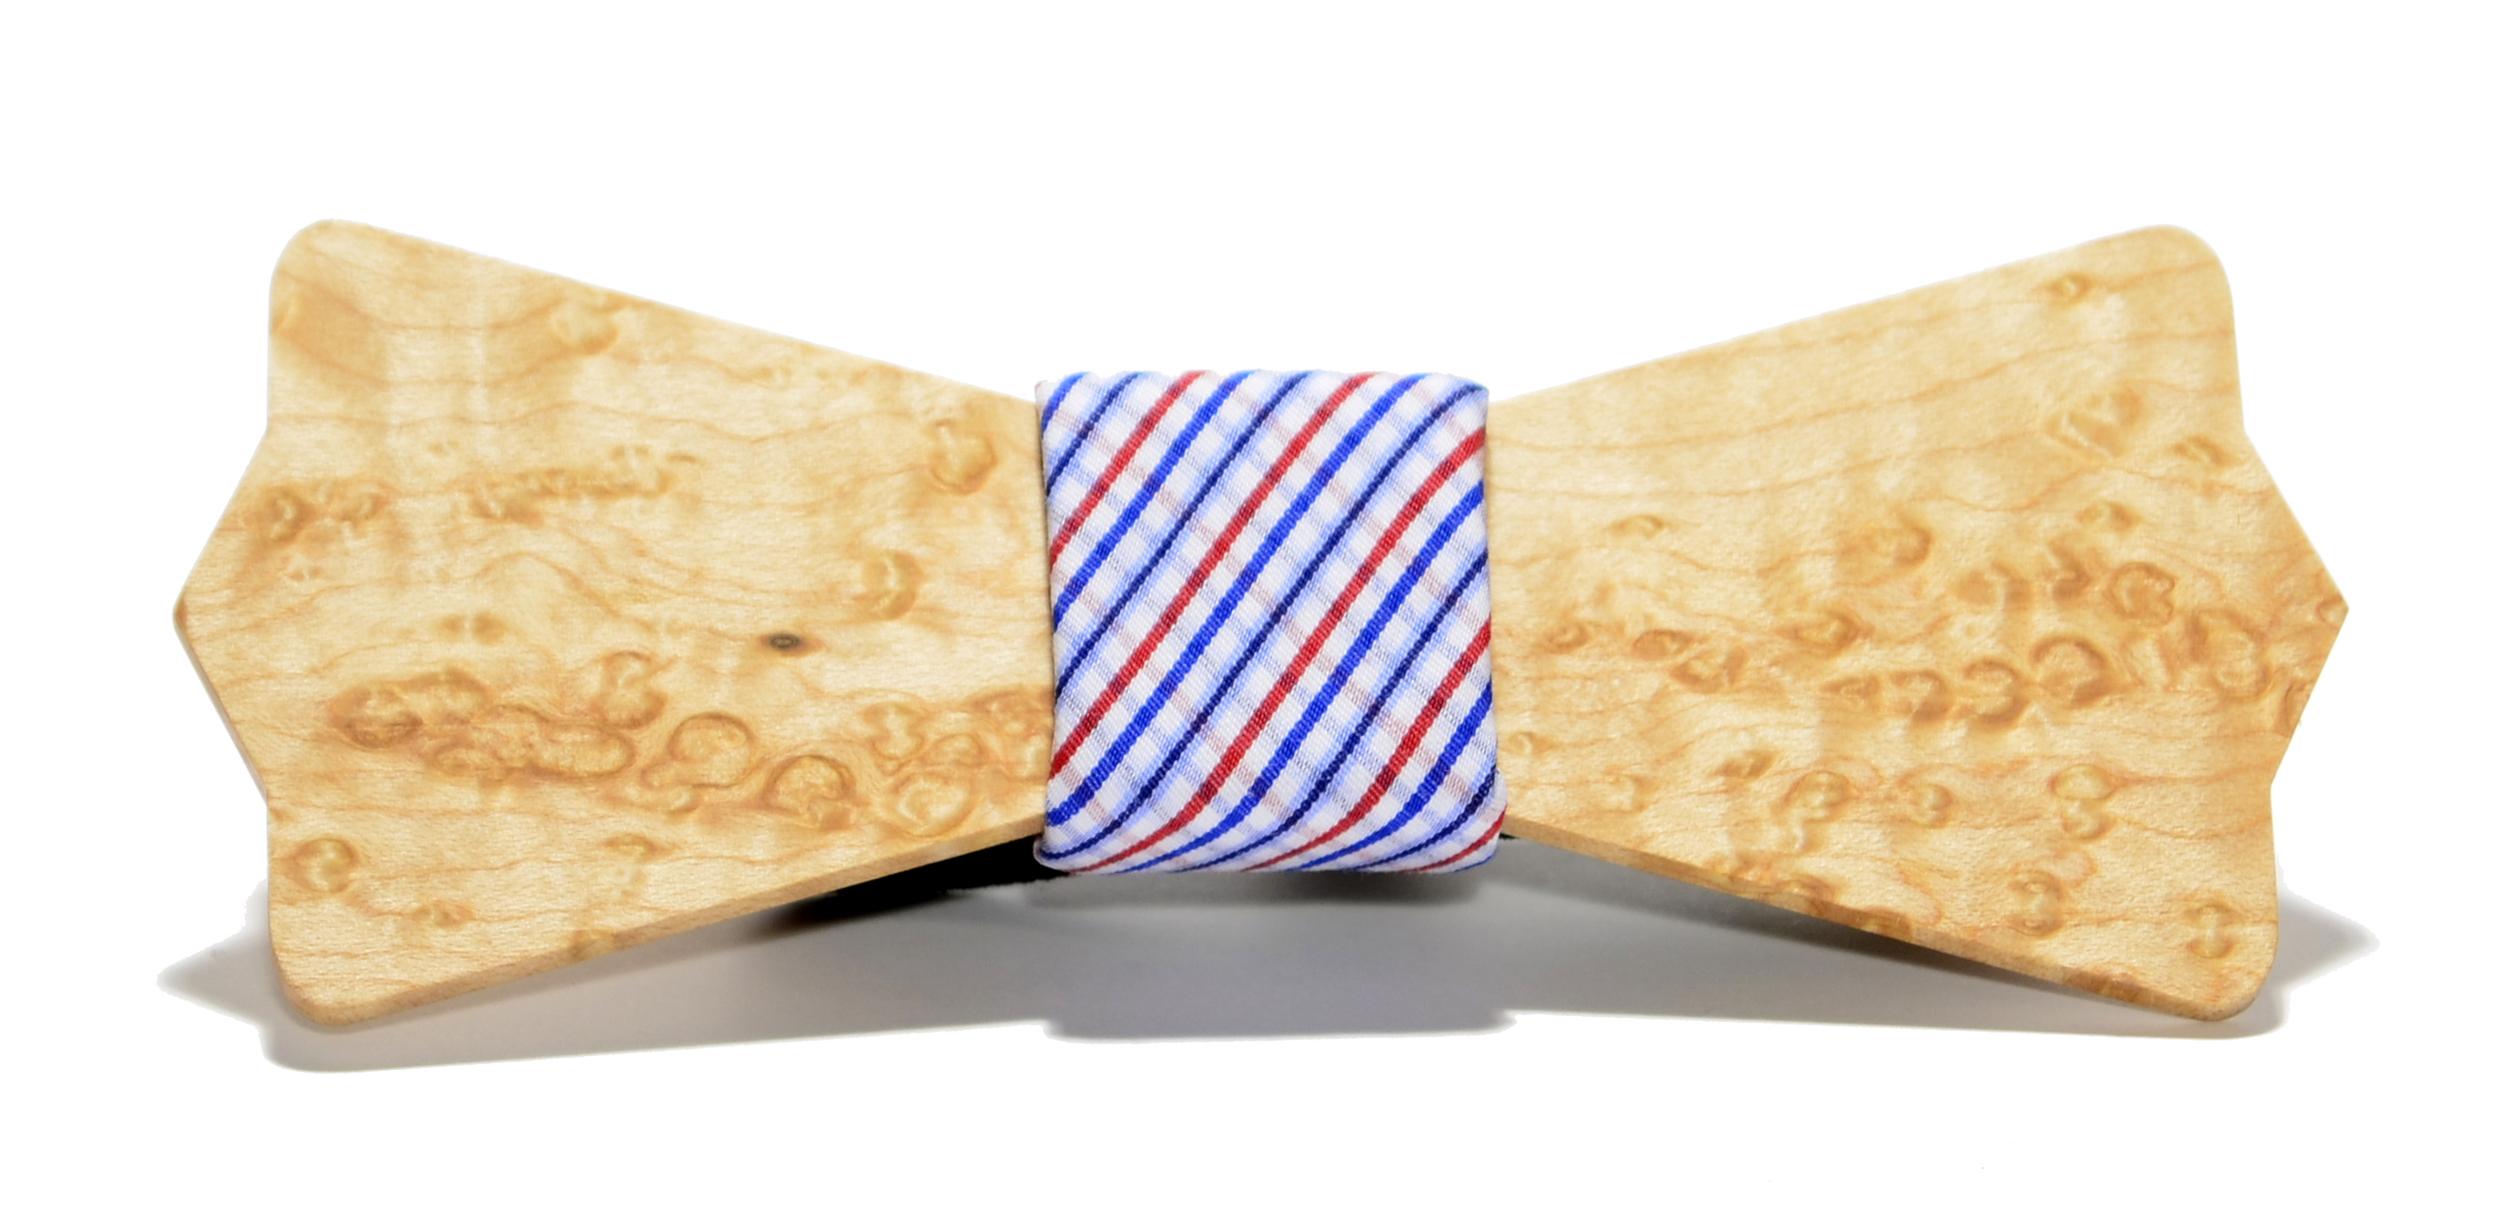 The Captain Birdseye Maple Diamond Point Cotton Wooden Bow Tie